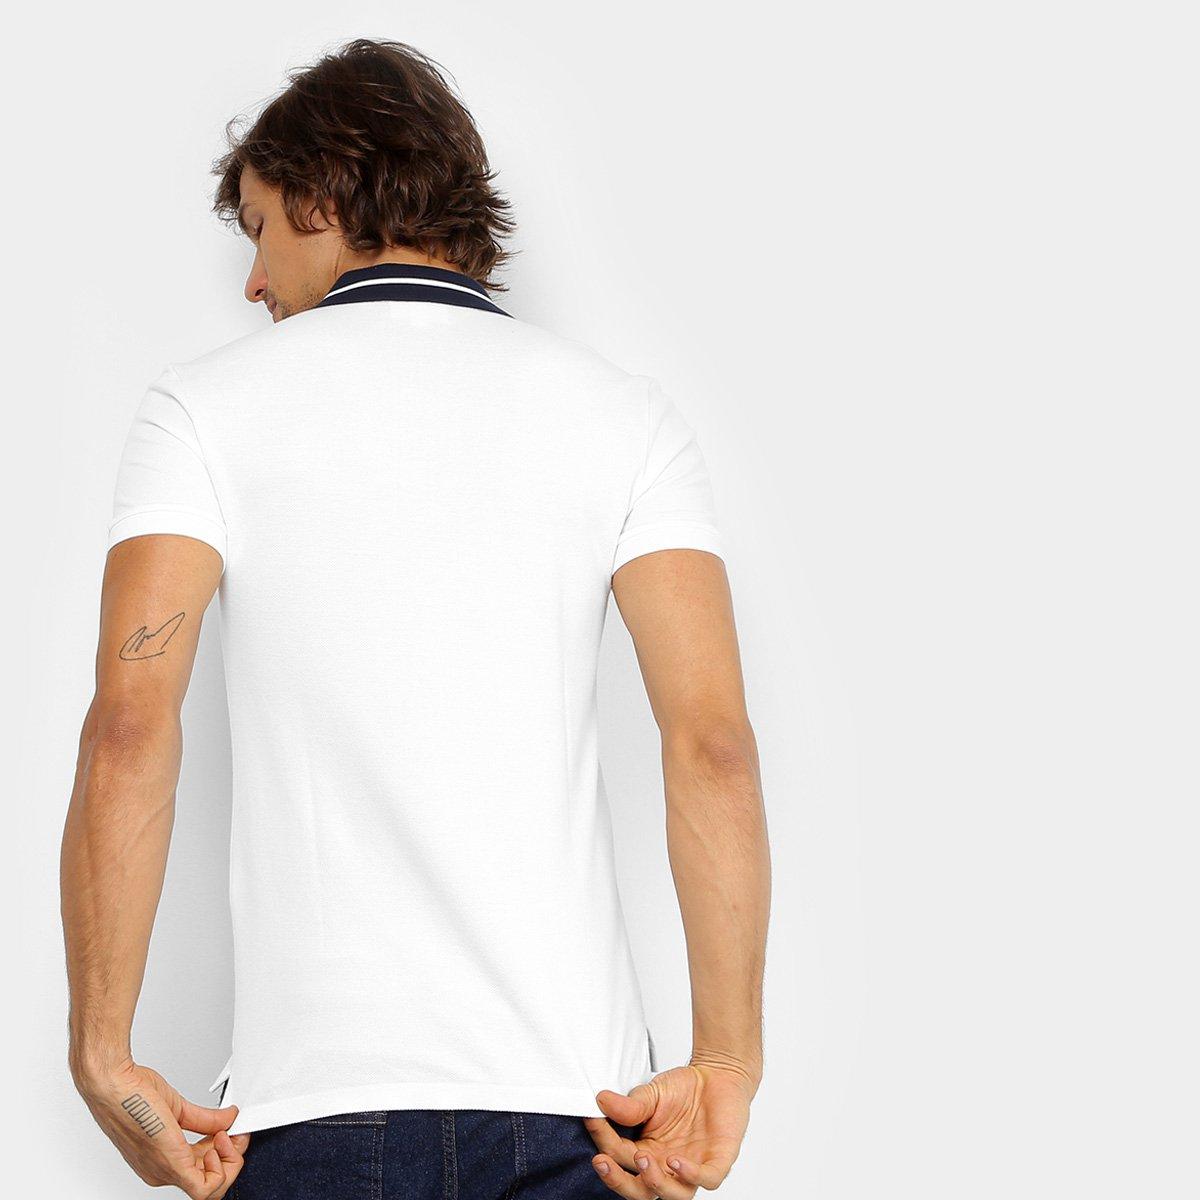 00823c685ebdd ... Camisa Polo Lacoste Piquet Slim Fit Fancy Contraste Masculina ...